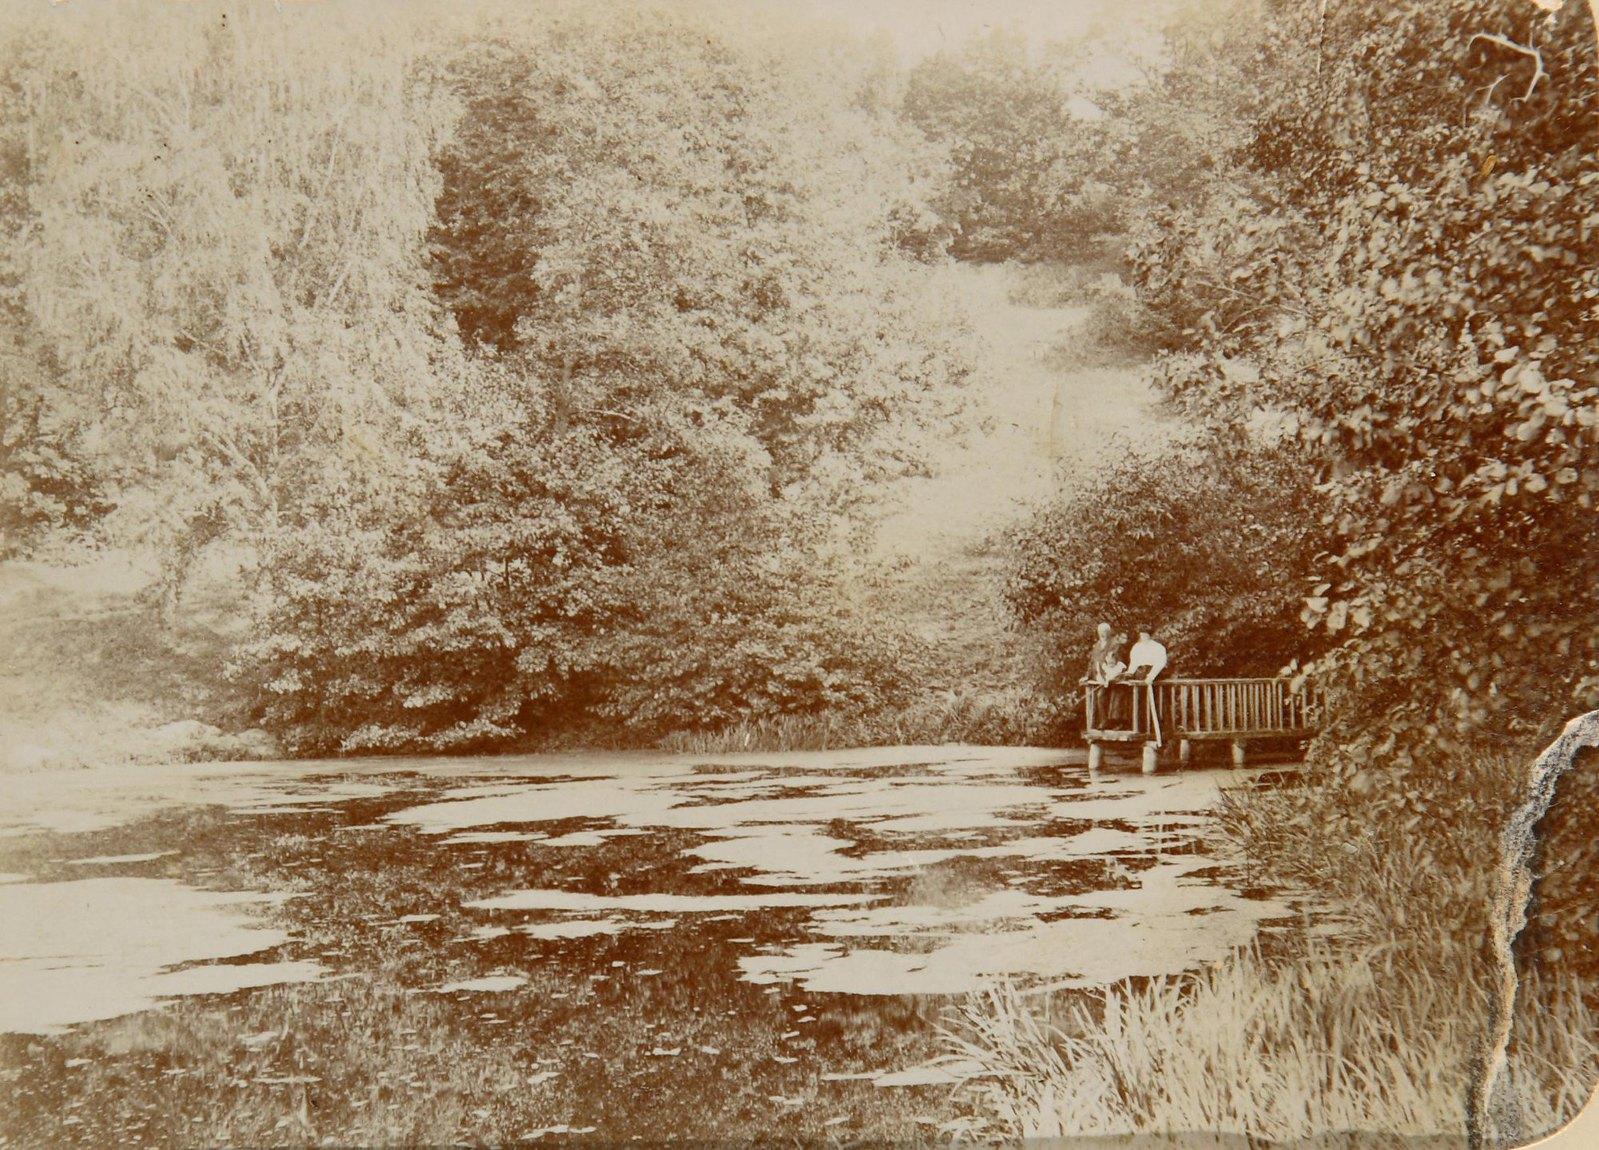 Группа на мостках у заросшего пруда